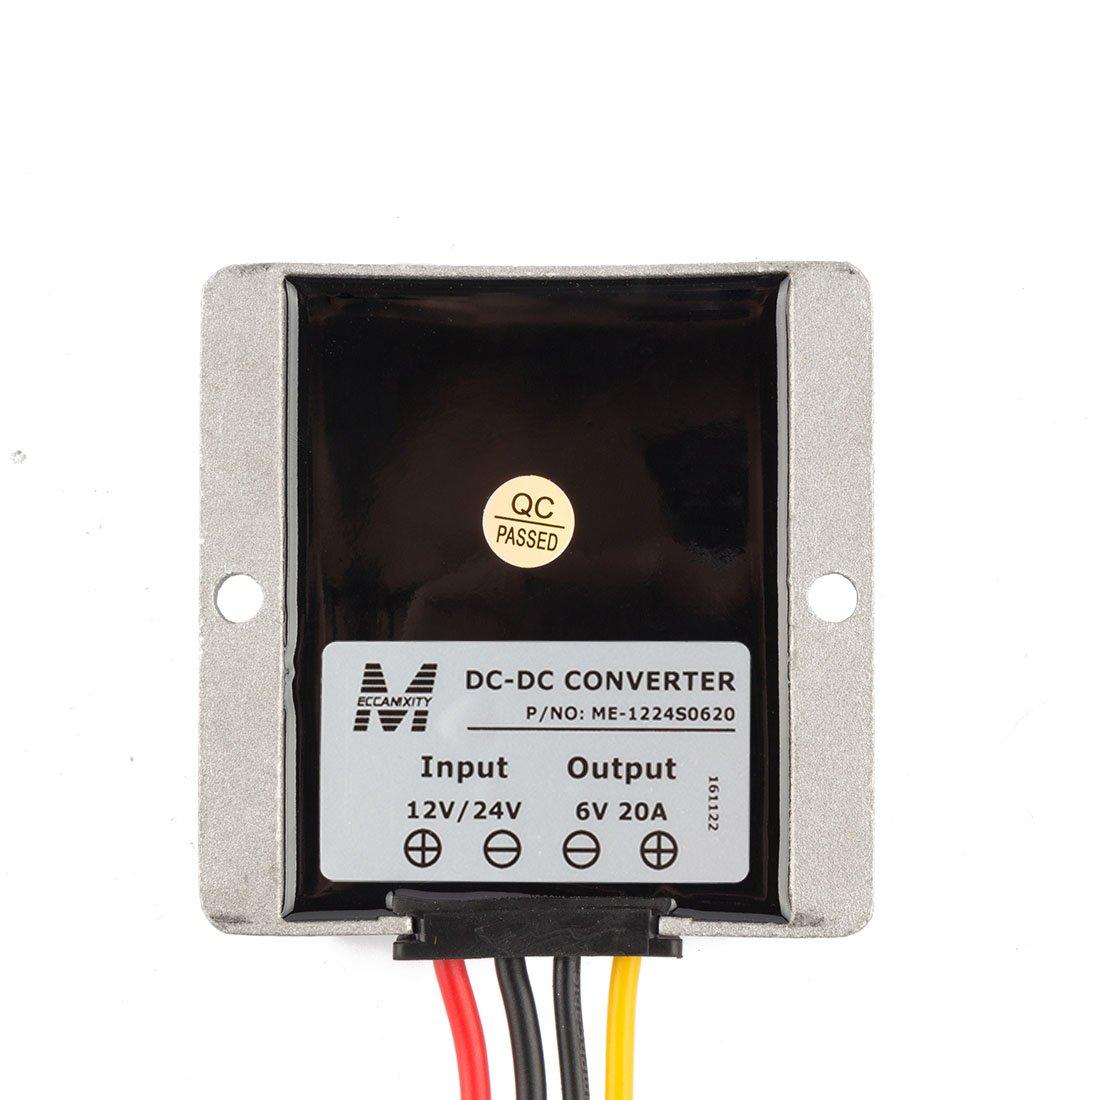 12v 24v To 6v 20a 120w Generic Power Converter Regulator Dc12v Tda2003 Voltage Dc Circuits Step Down Dc6v Waterproof Convert Transformer